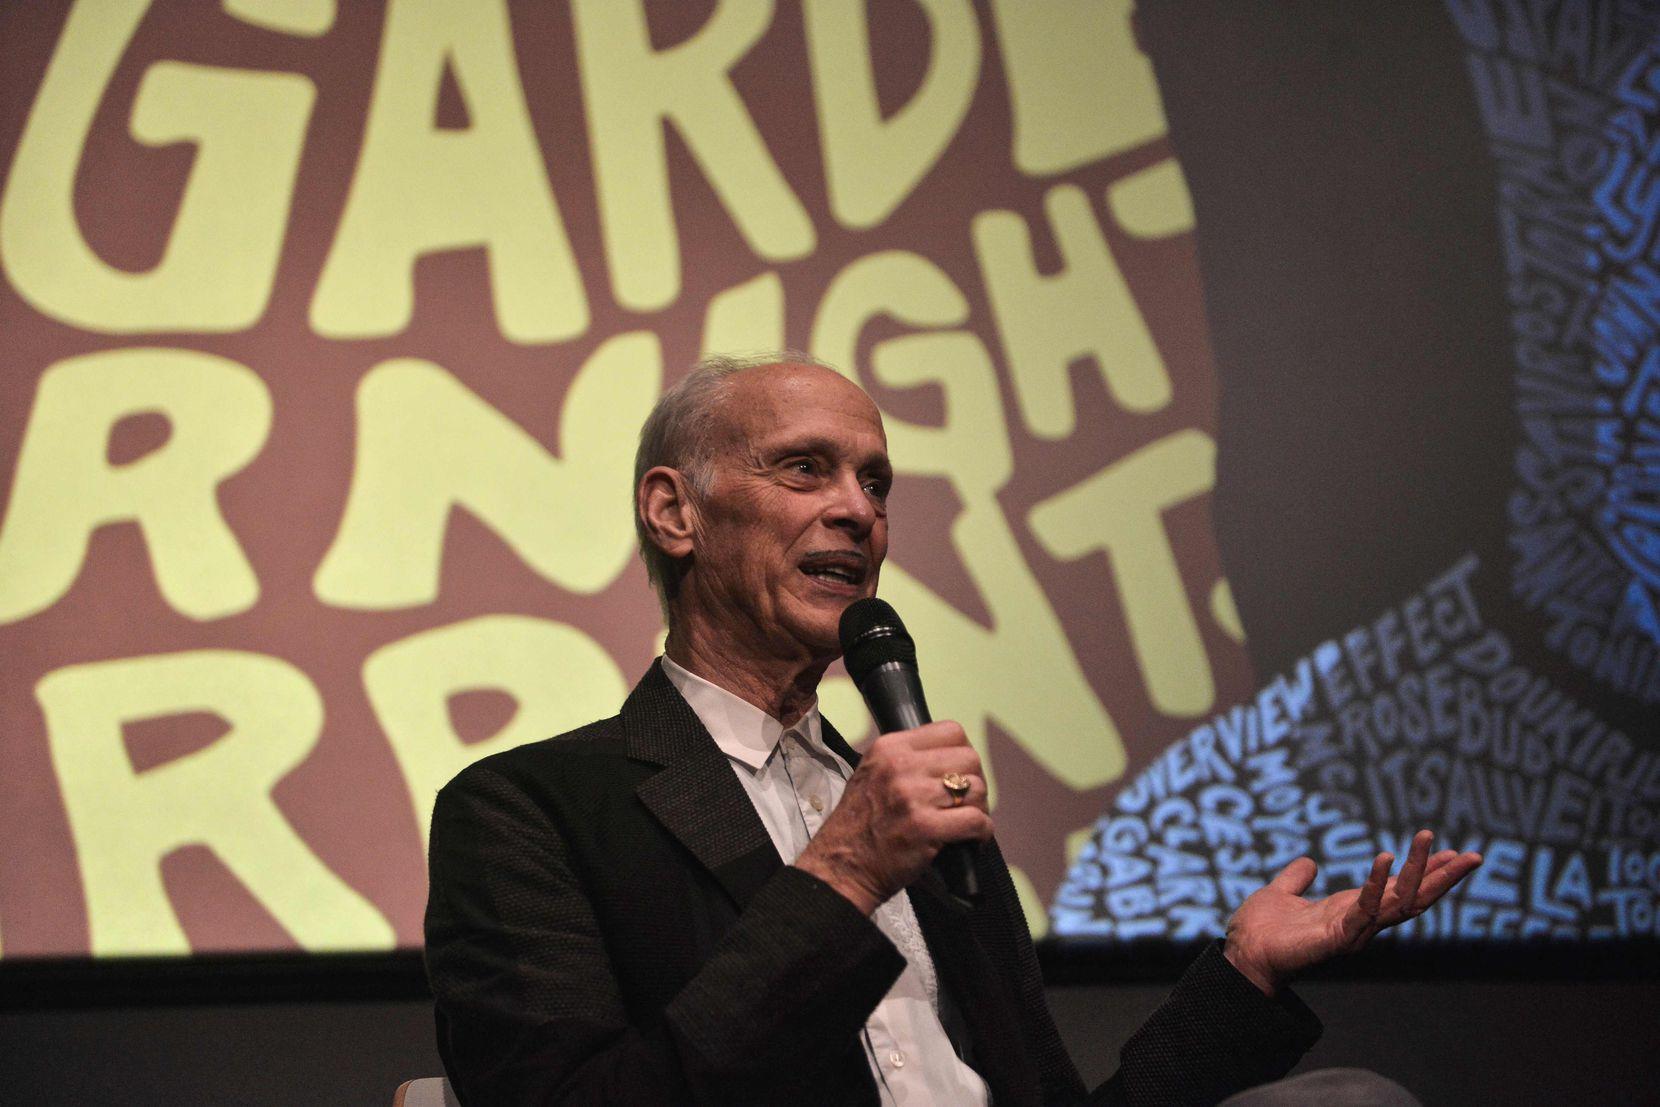 John Waters speaks during a masterclass as part of the 60th Thessaloniki International Film Festival (TIFF) in Thessaloniki, Greece, on Nov. 7, 2019.